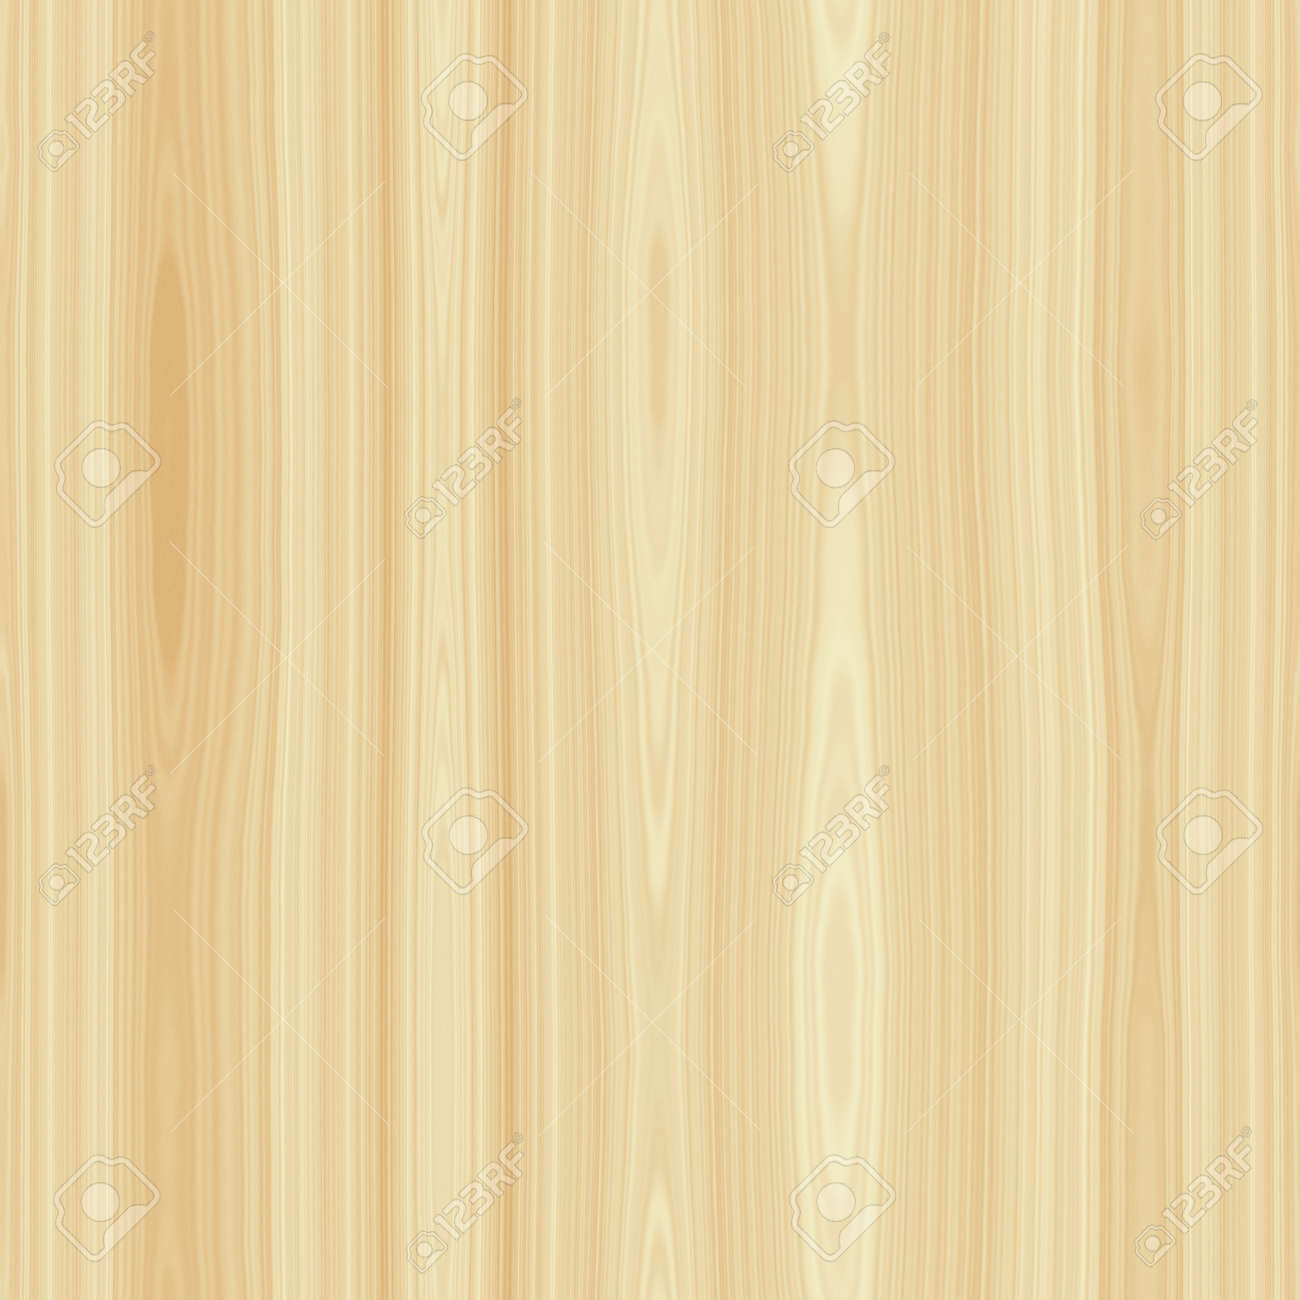 wood texture seamless. Illustration - Seamless Wood Texture Background Closeup. Light